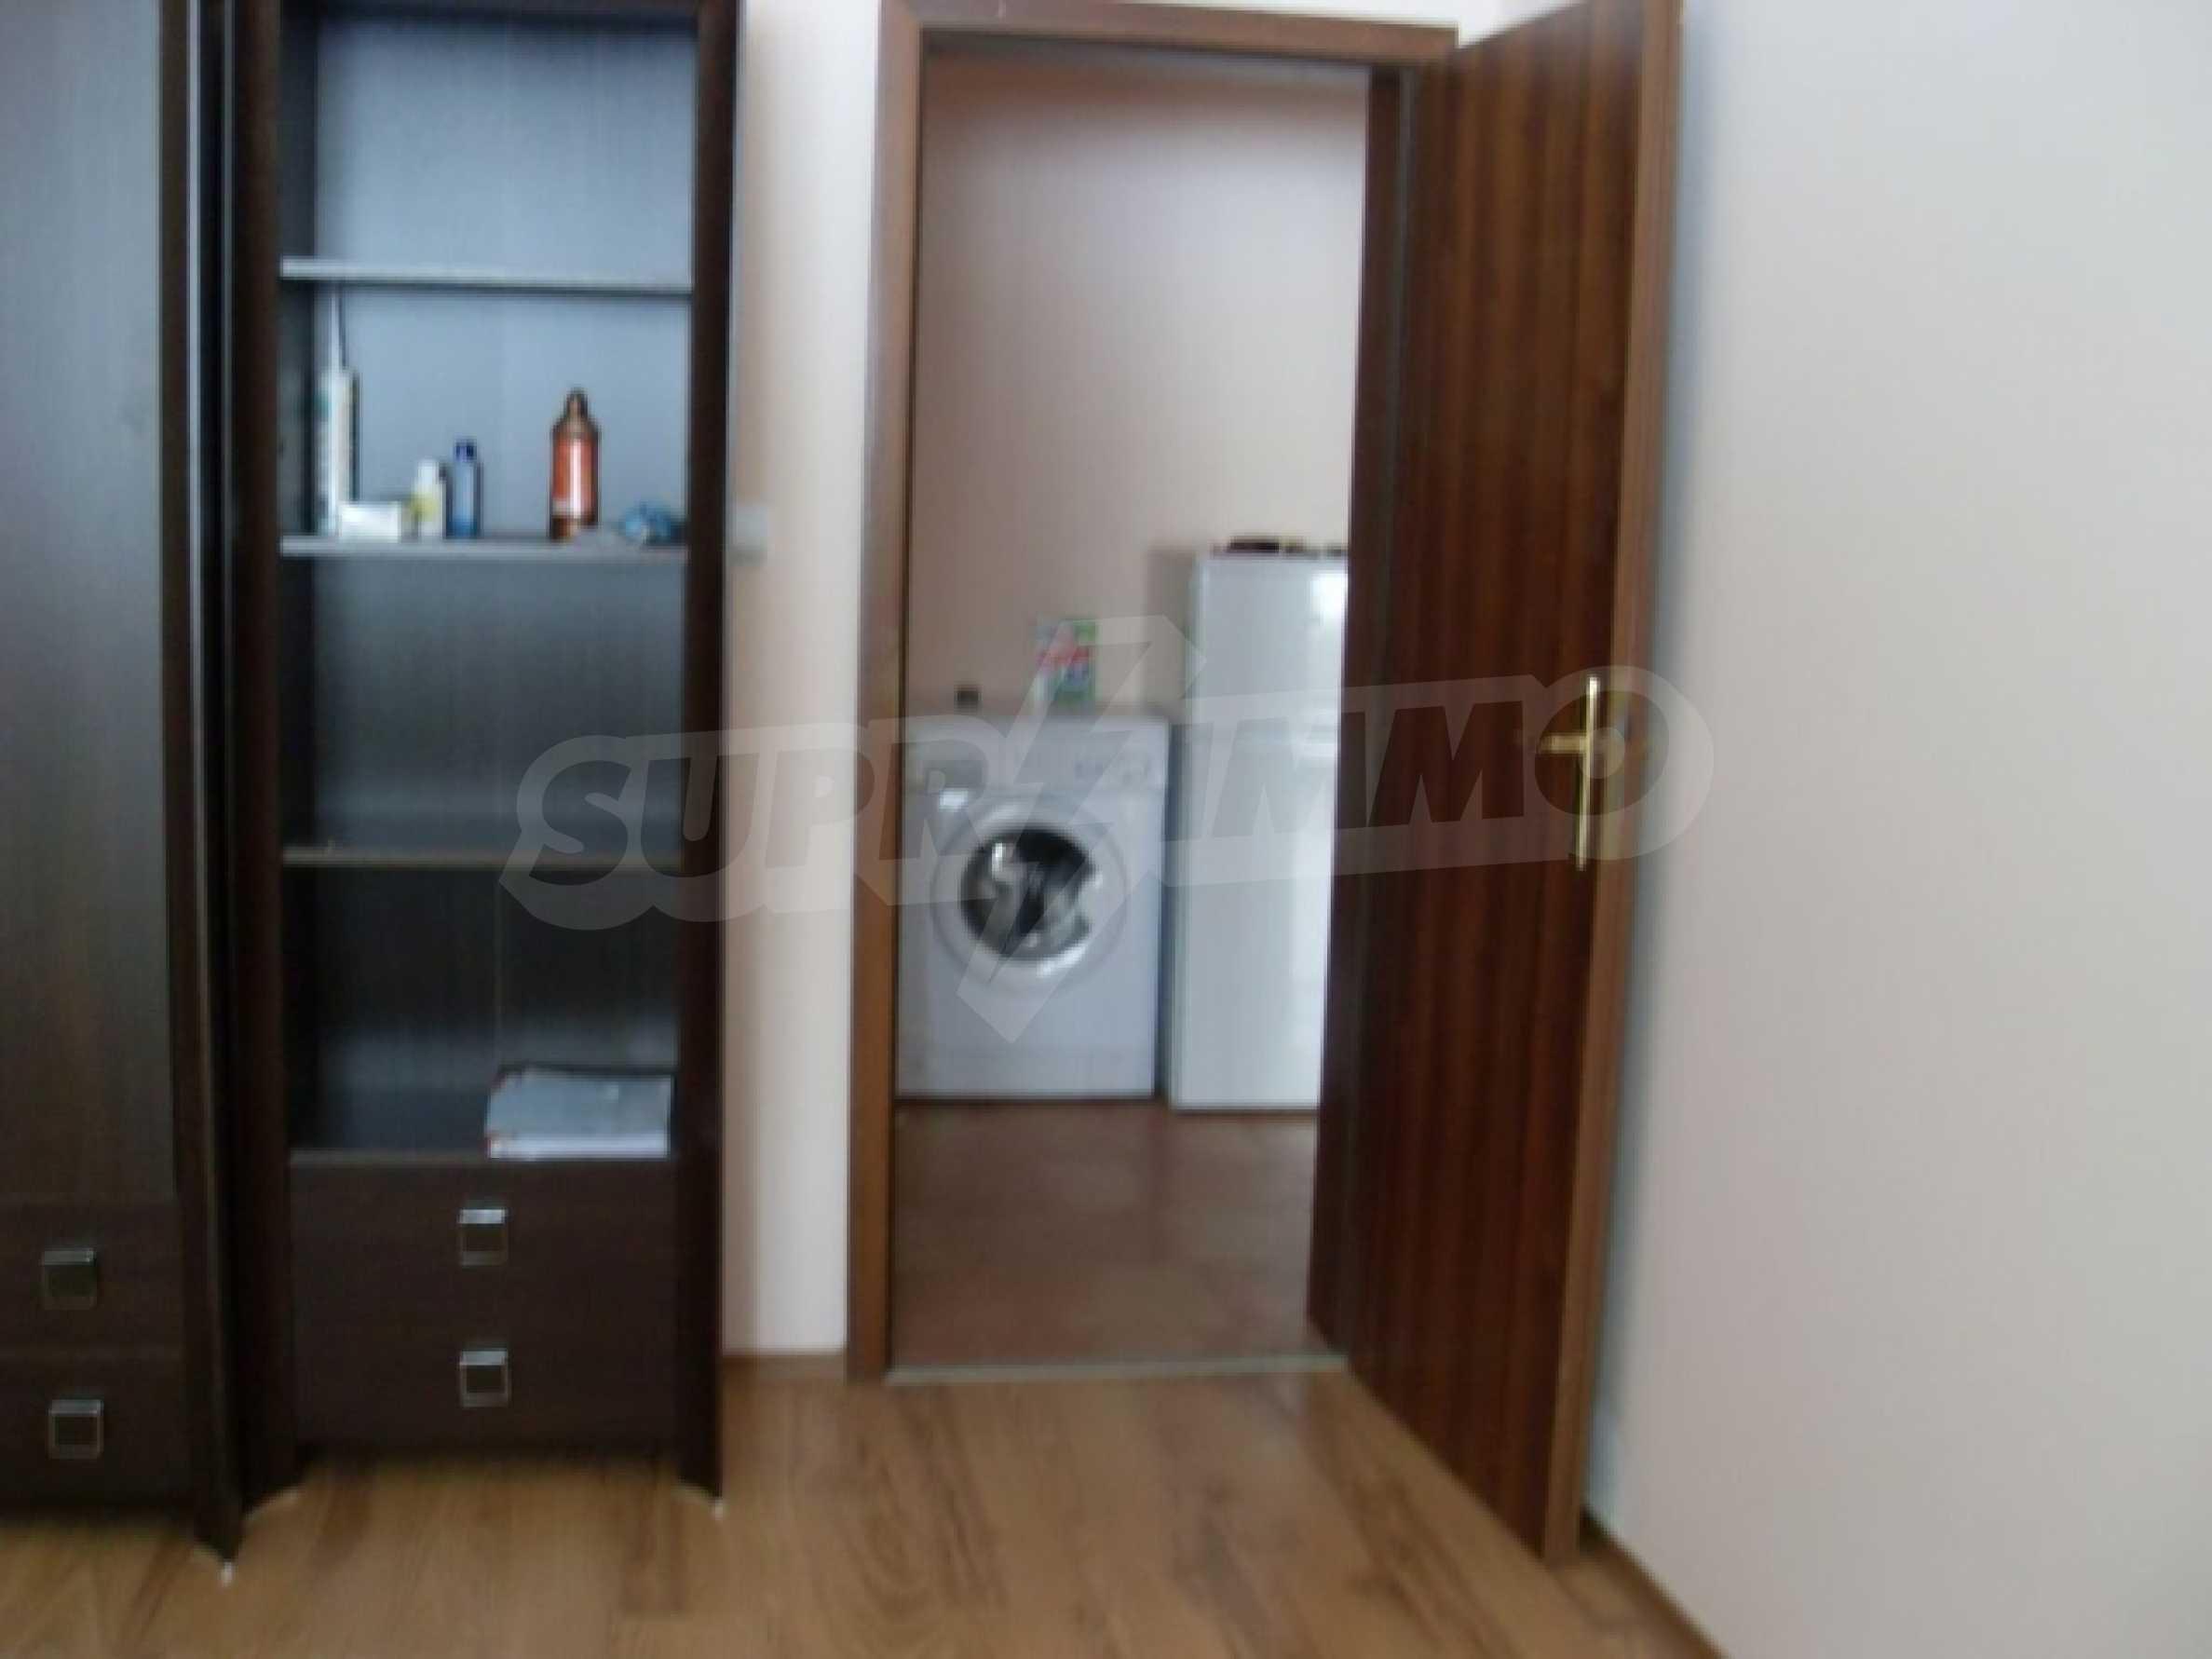 Просторная 2-комнатная квартира в комплексе Evrika (Эврика) 12